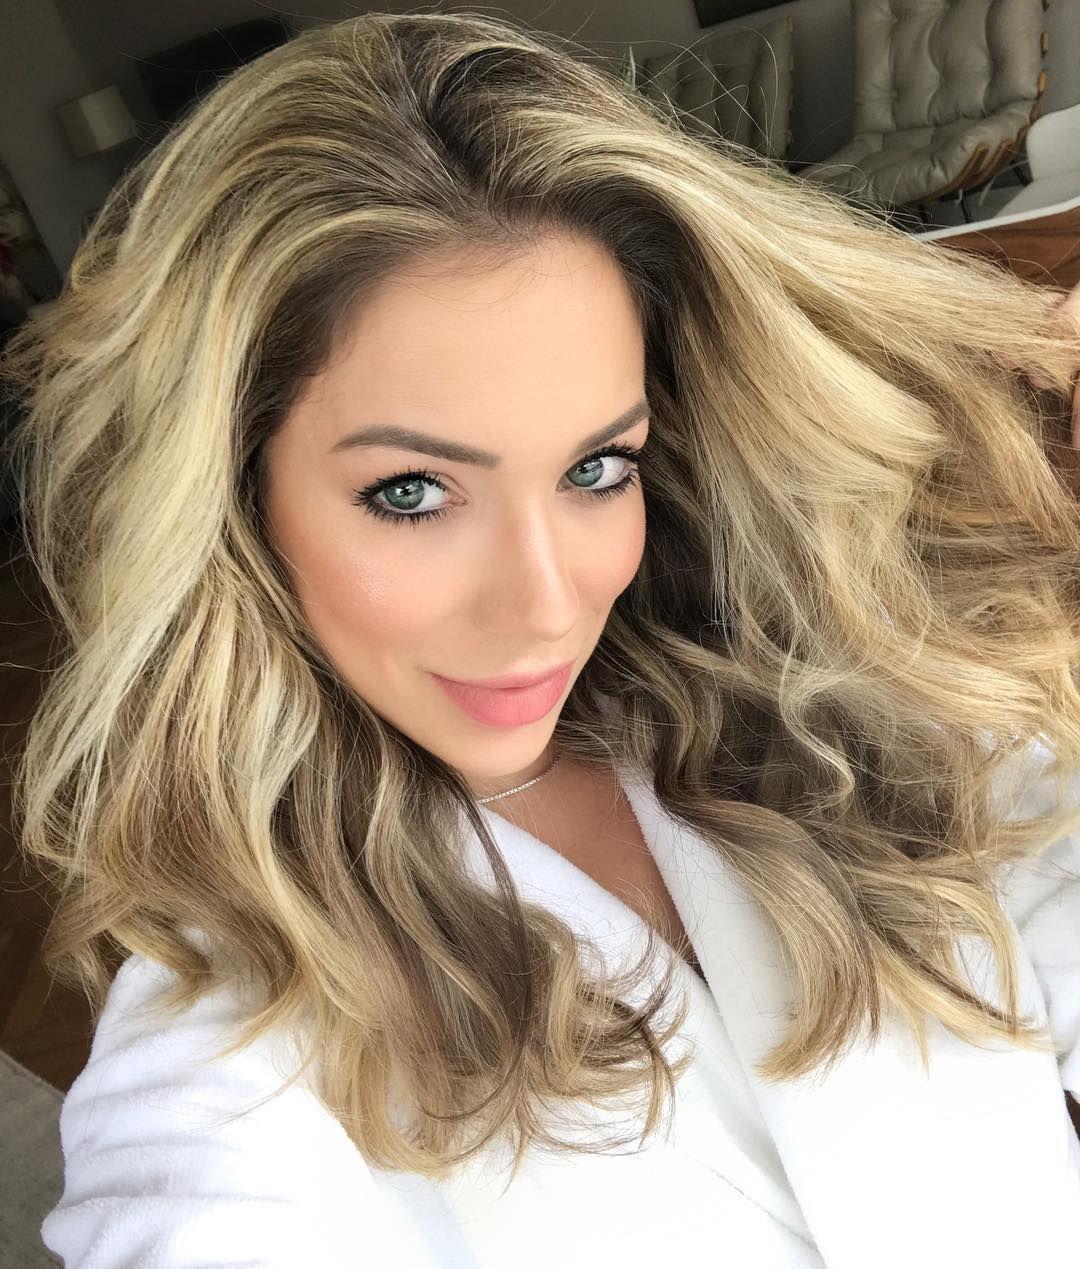 Jennifer Lopez Pony Frisur Neueste Frisur Galerie